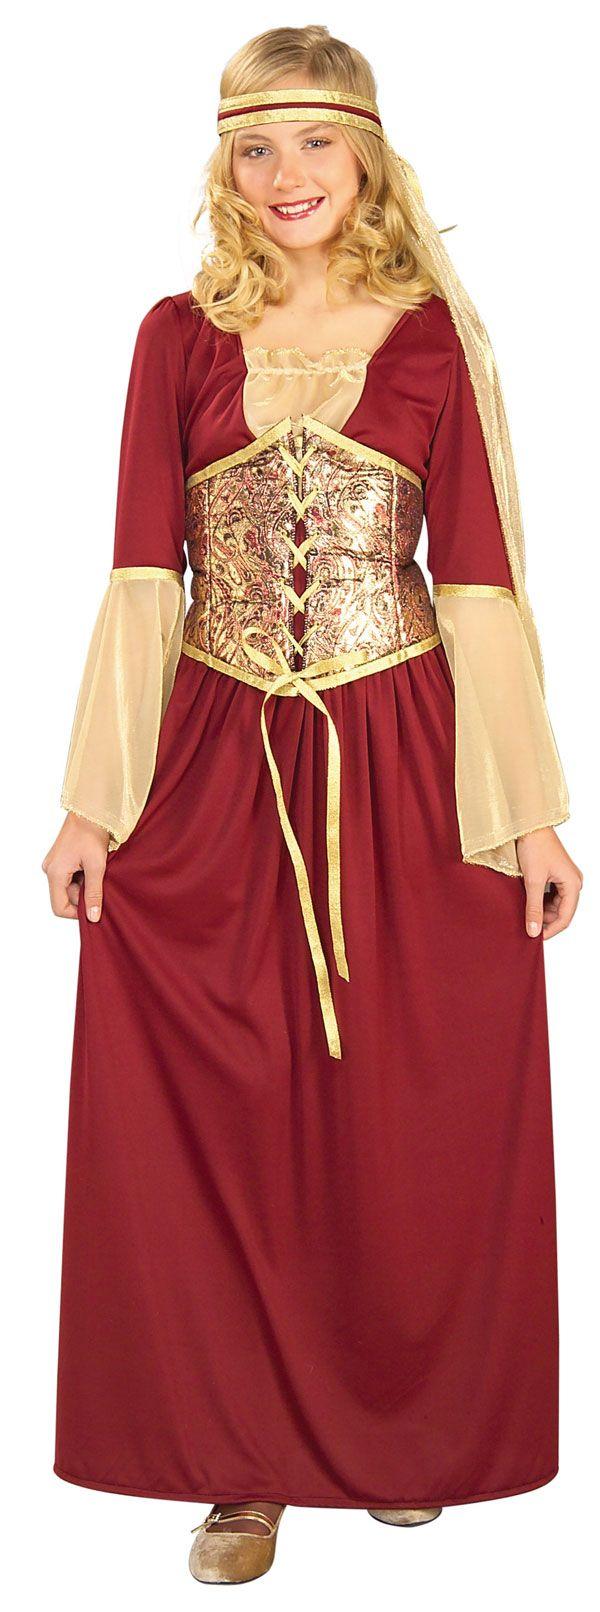 medieval peasant costume idea for women | Renaissance Peasant Costume Medieval Or Renaissance Costumes  sc 1 st  Pinterest & medieval peasant costume idea for women | Renaissance Peasant ...